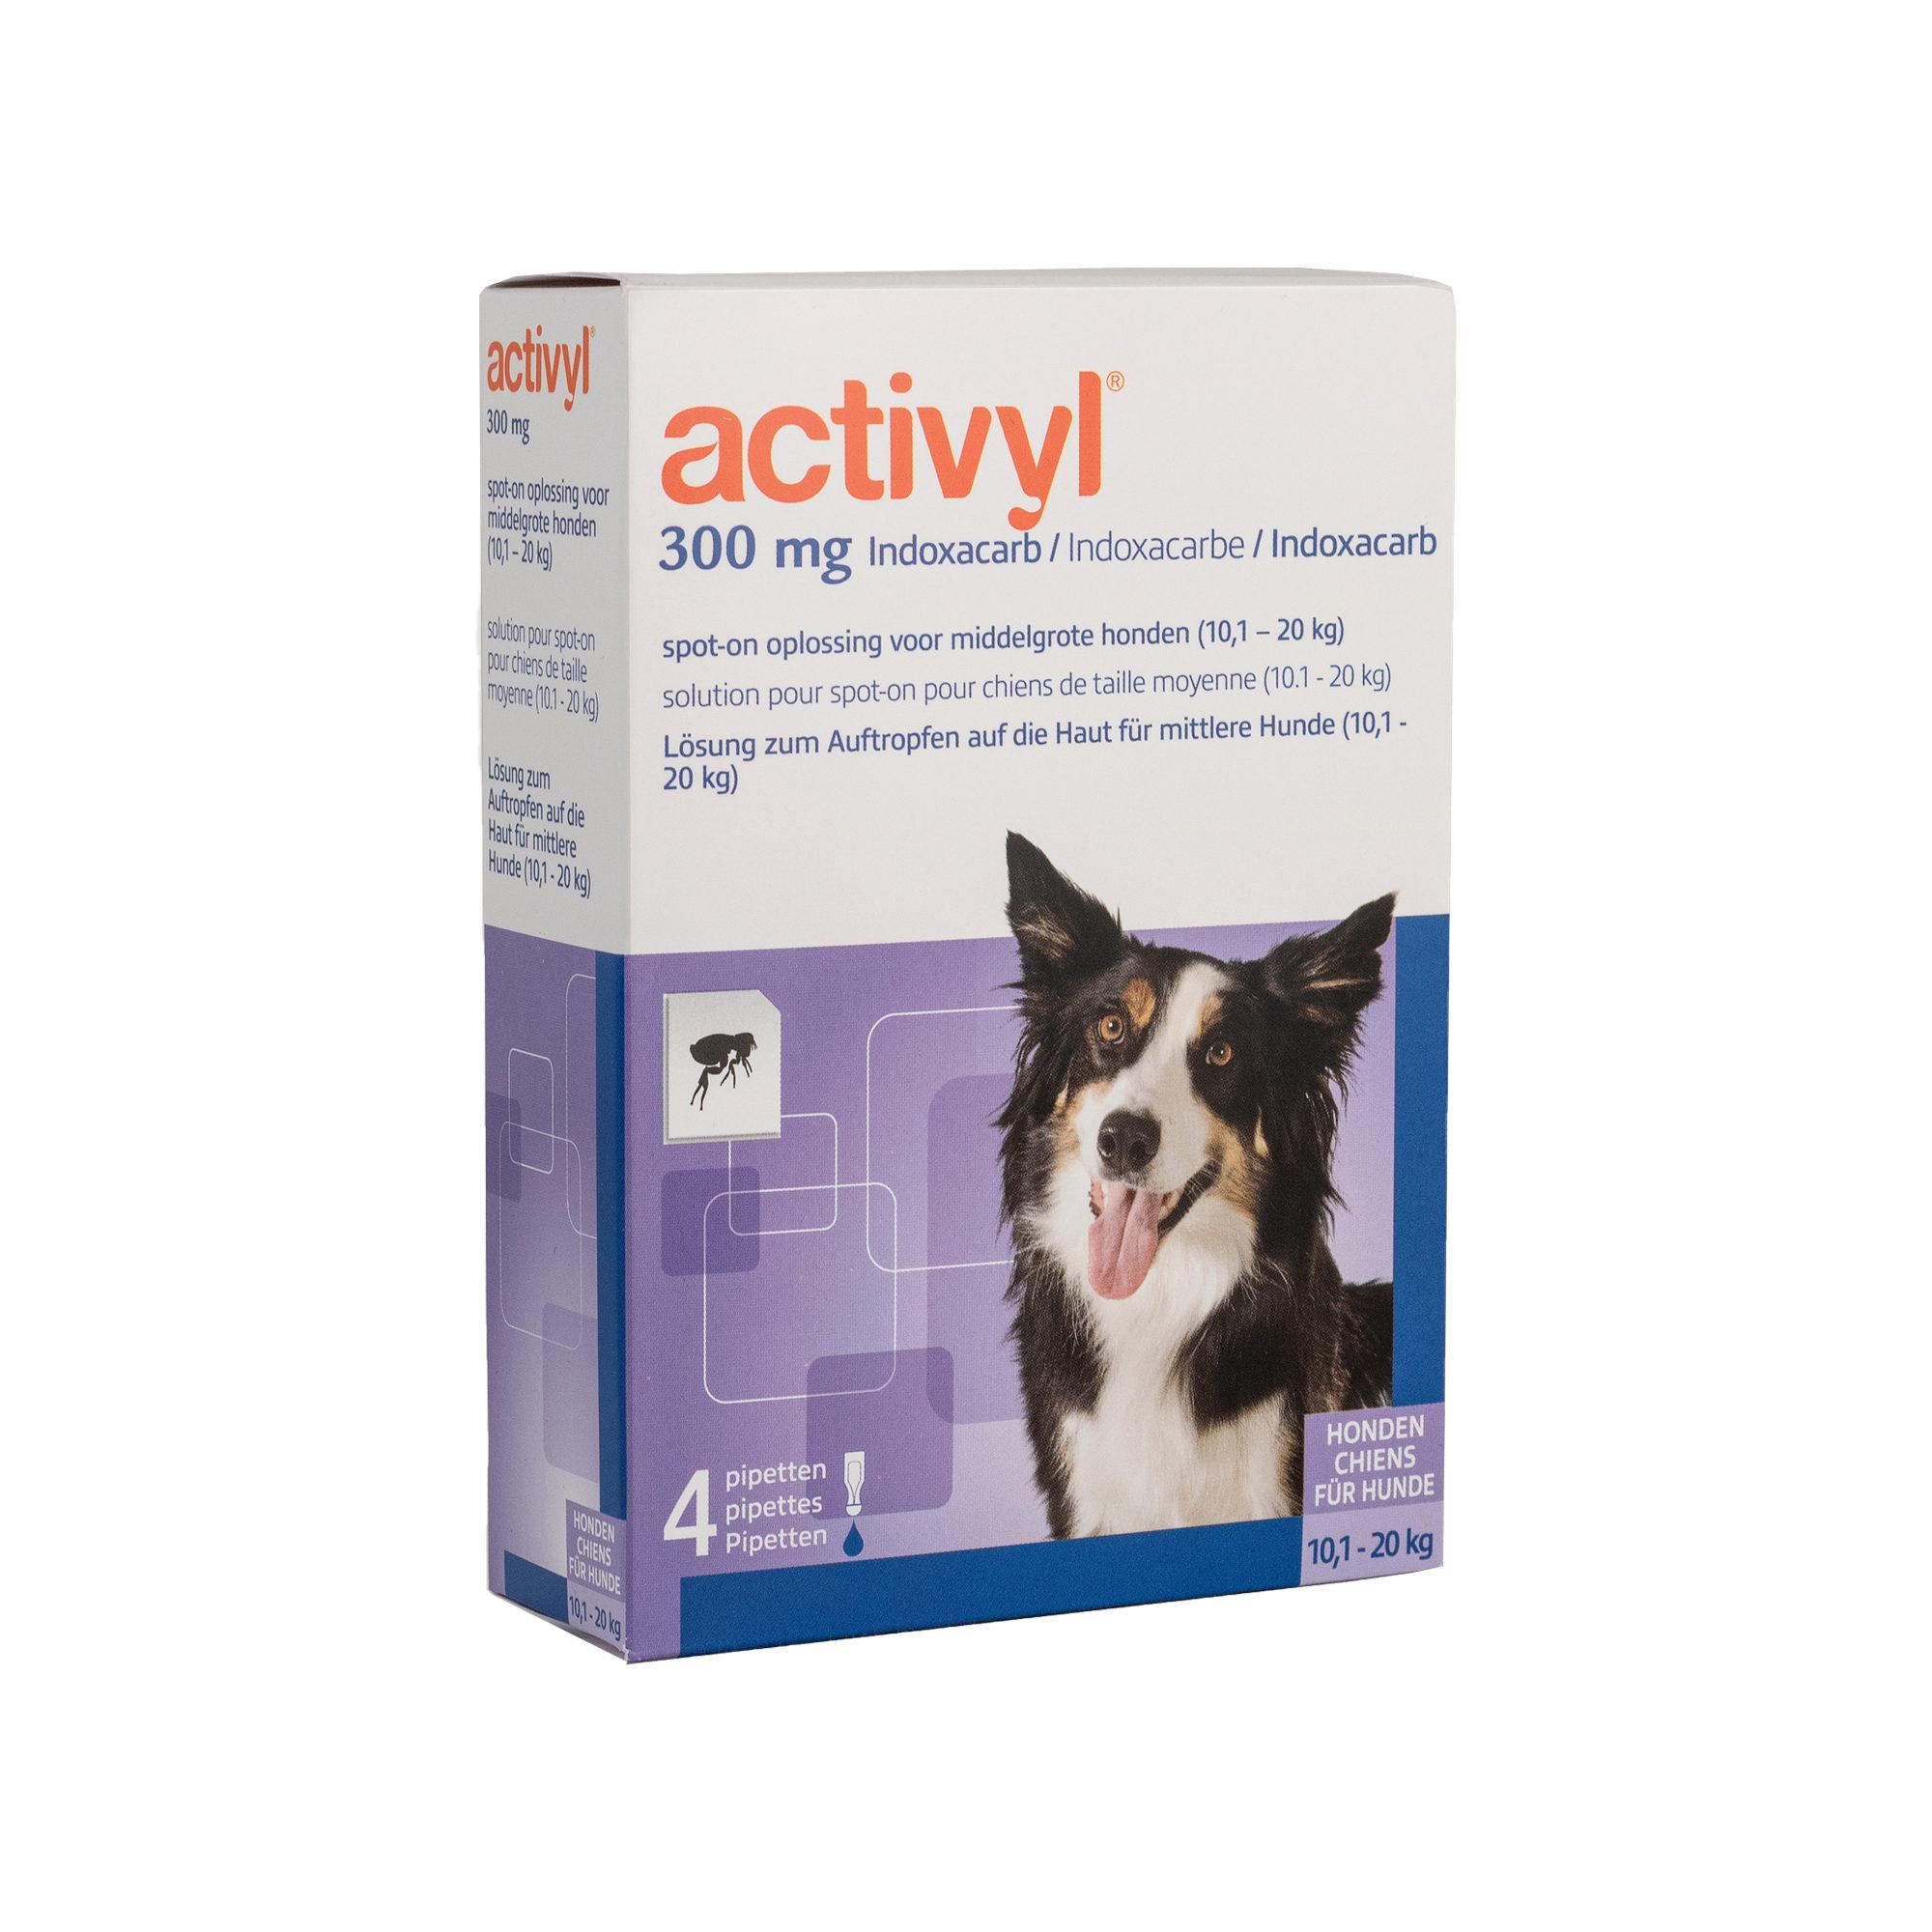 Activyl Spot-on Hund M - 10 - 20 kg - 4 Pipetten